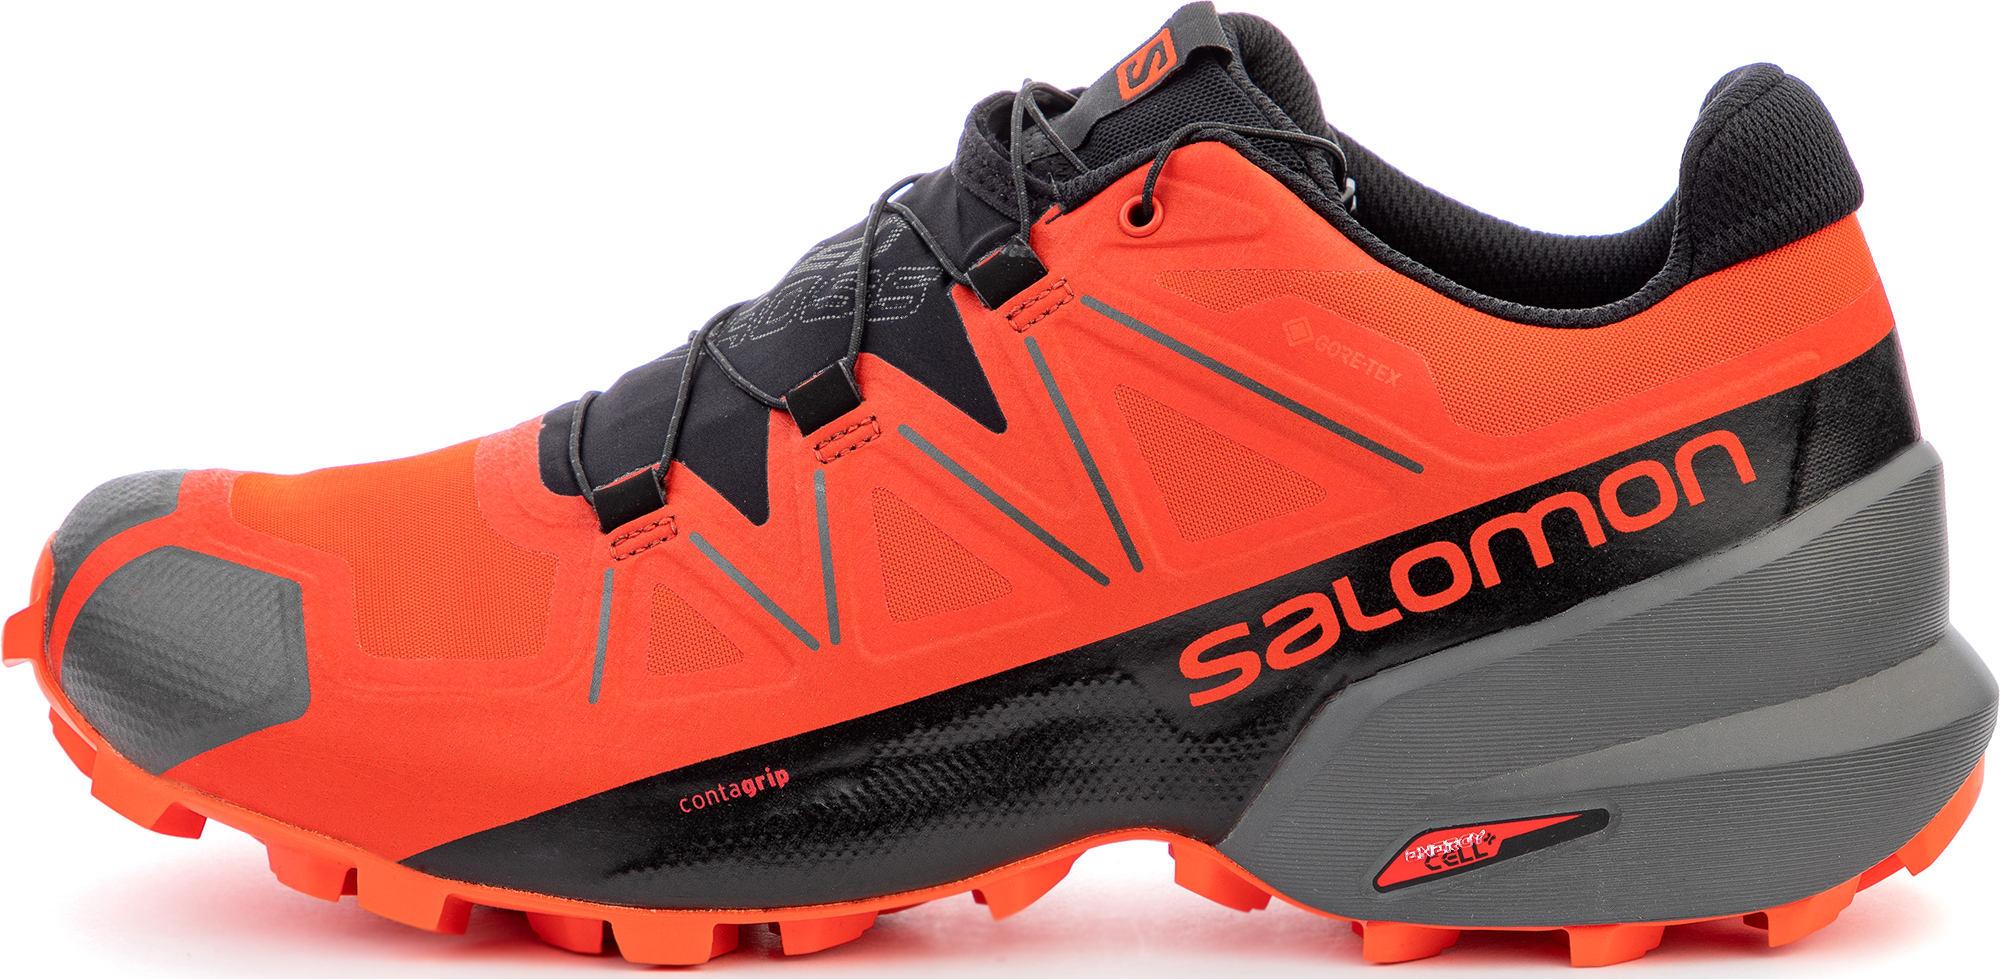 Salomon Кроссовки мужские Salomon Speedcross 5, размер 42